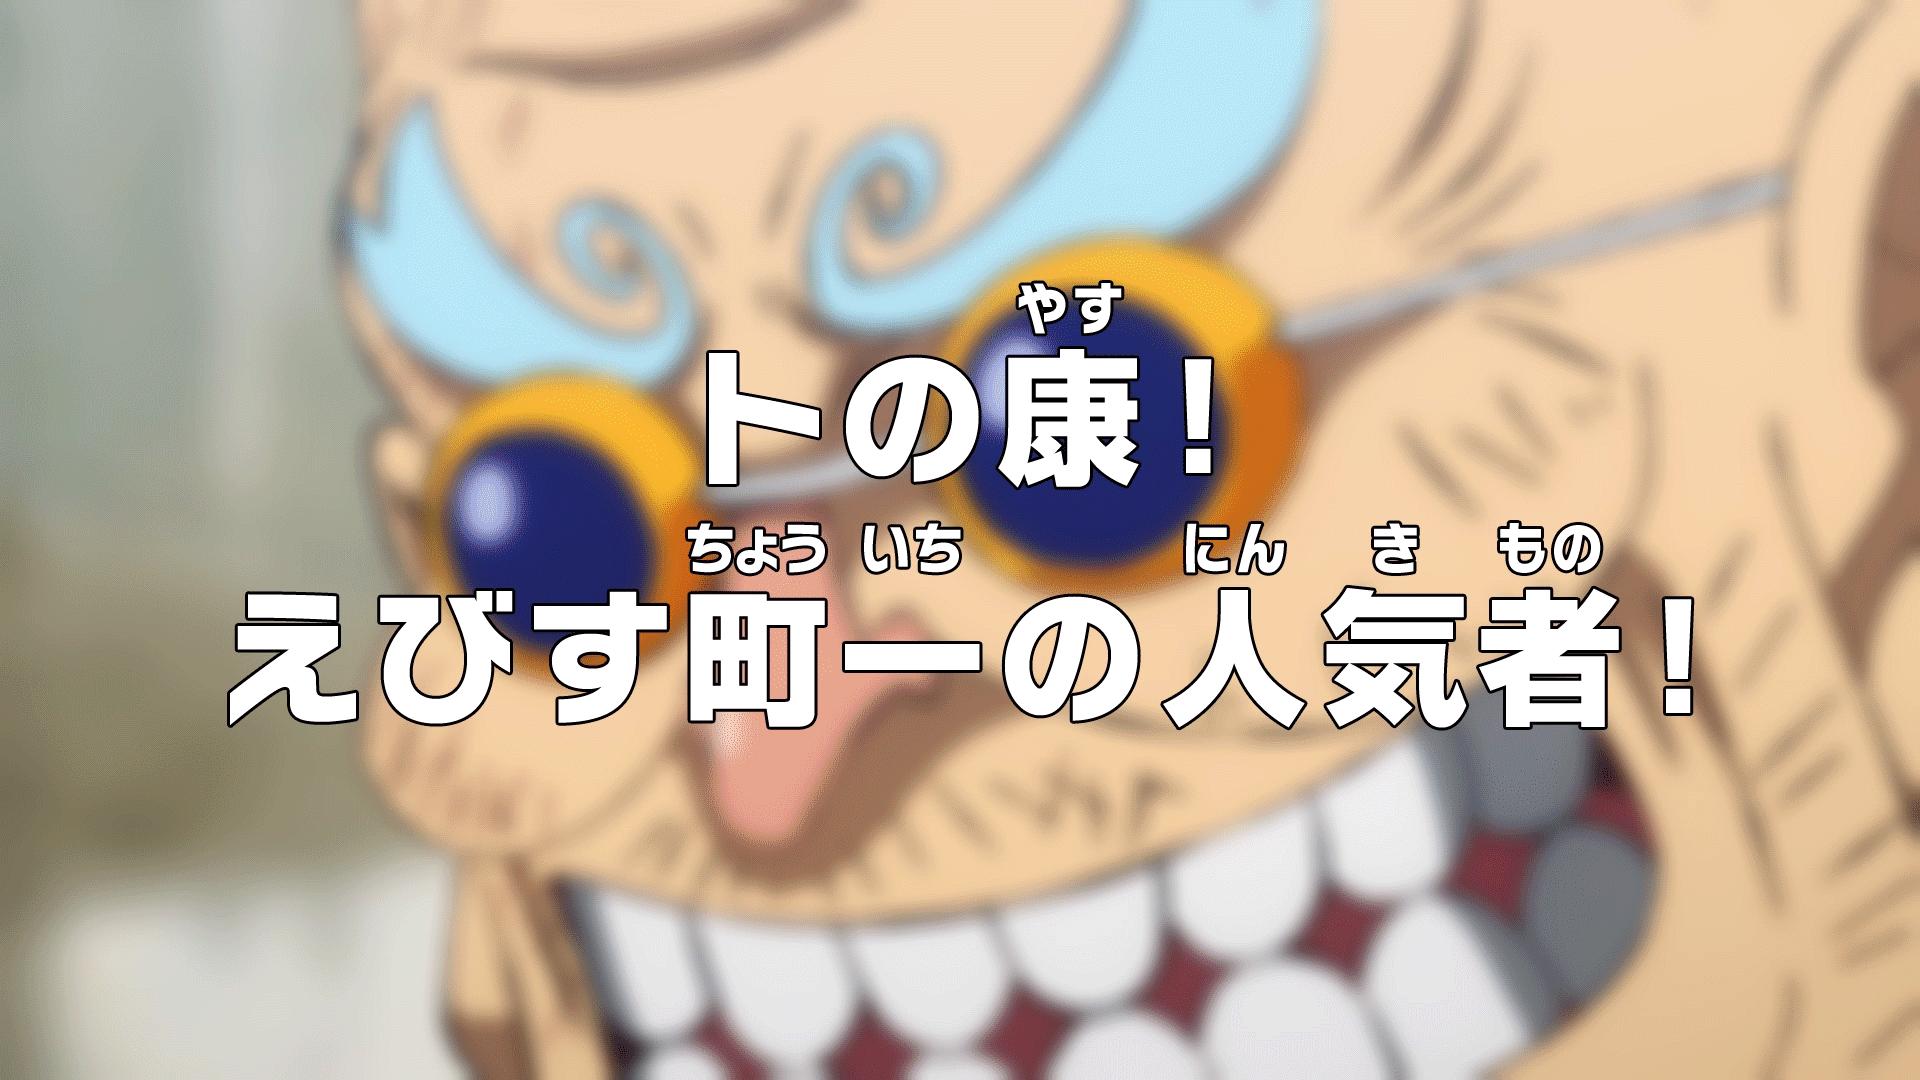 Episode 937